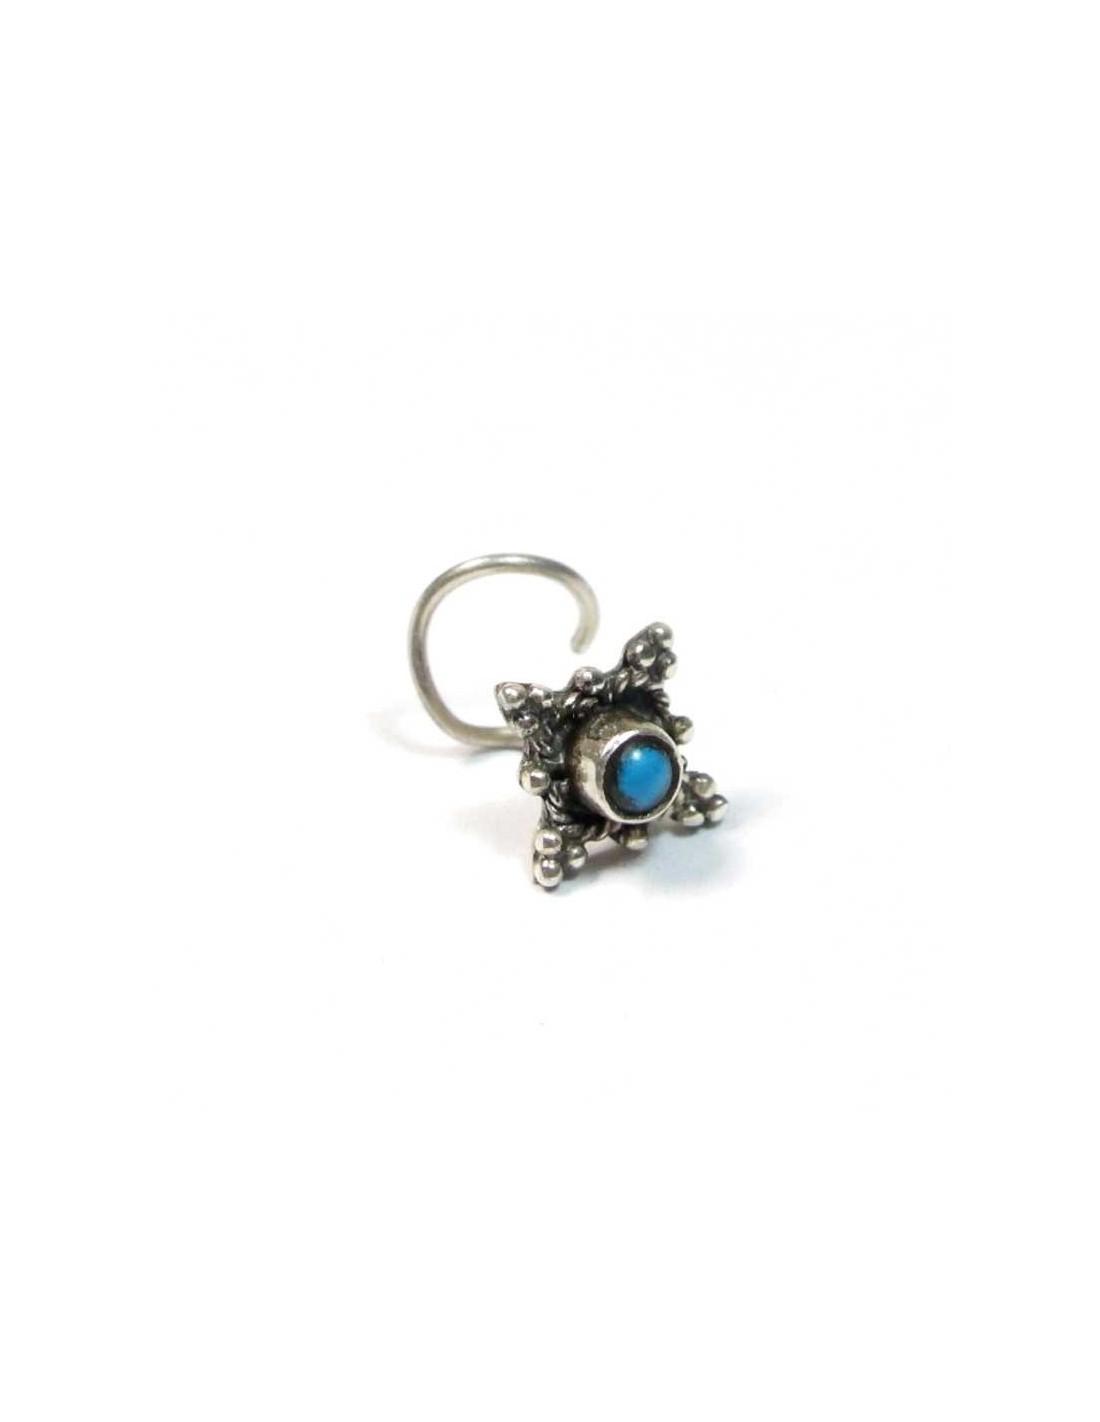 piercing argent et turquoise piercing traditionnel indien co41. Black Bedroom Furniture Sets. Home Design Ideas